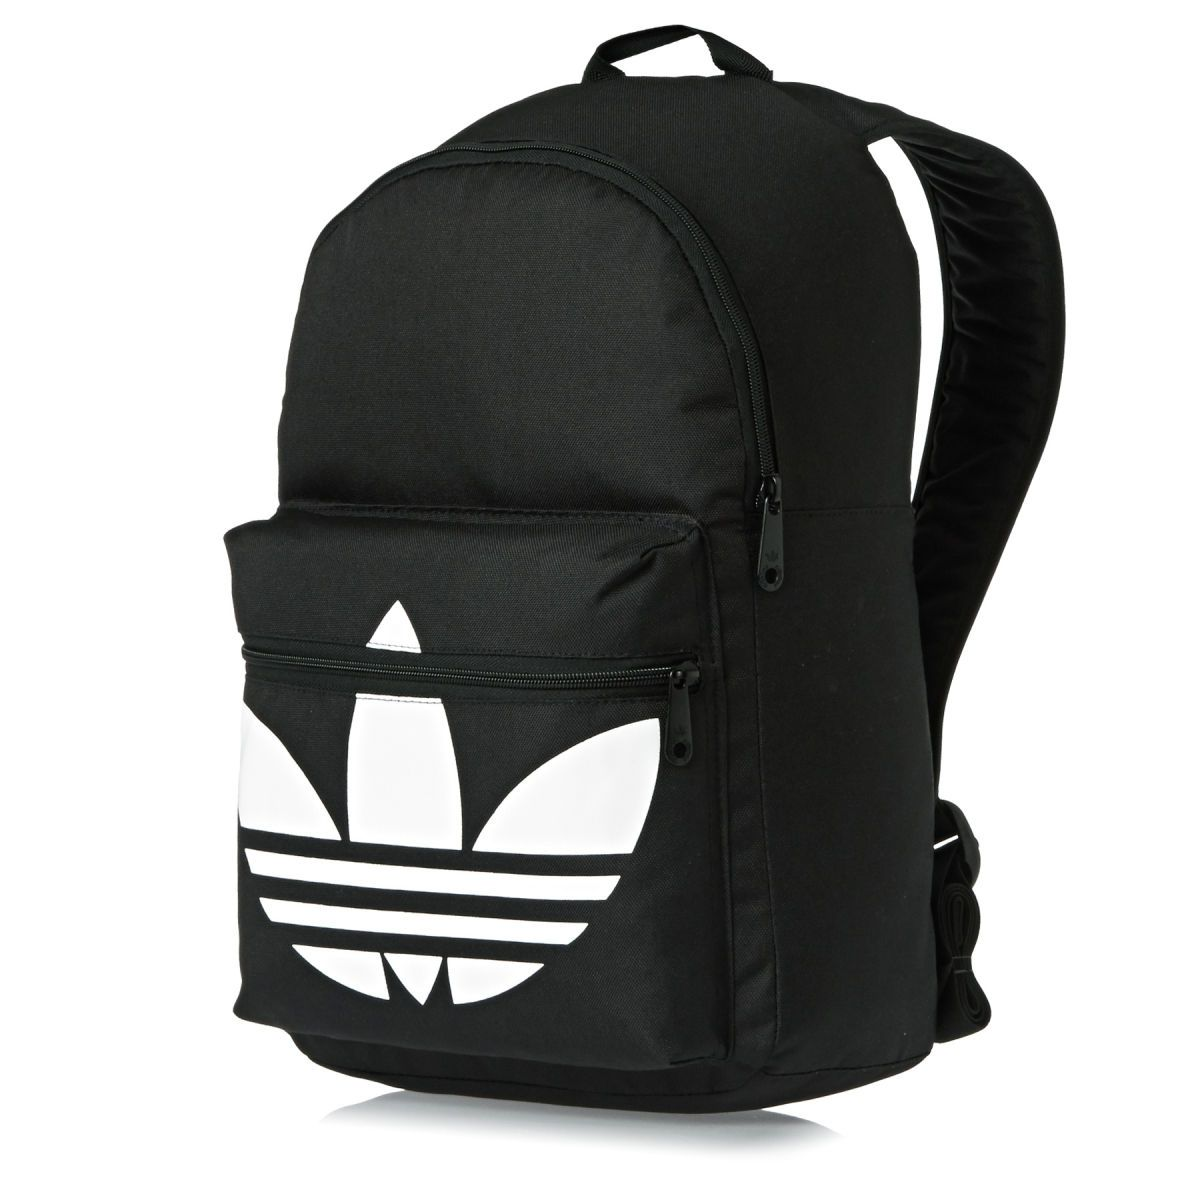 Adidas Originals Backpacks Adidas Originals Classic